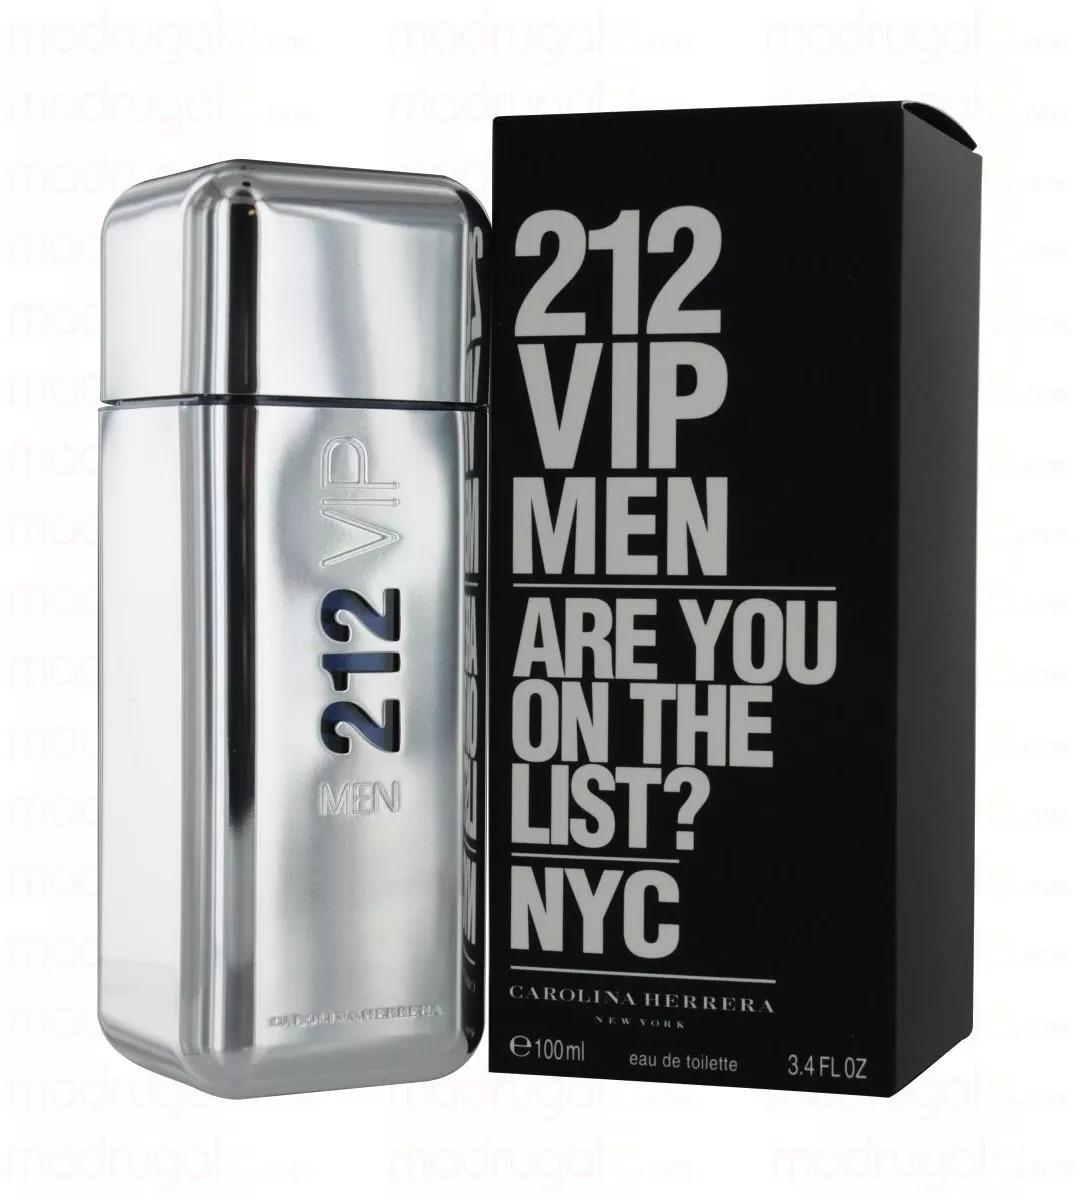 2da065a26 perfume importado carolina herrera 212 vip men edt x 100ml. Cargando zoom.